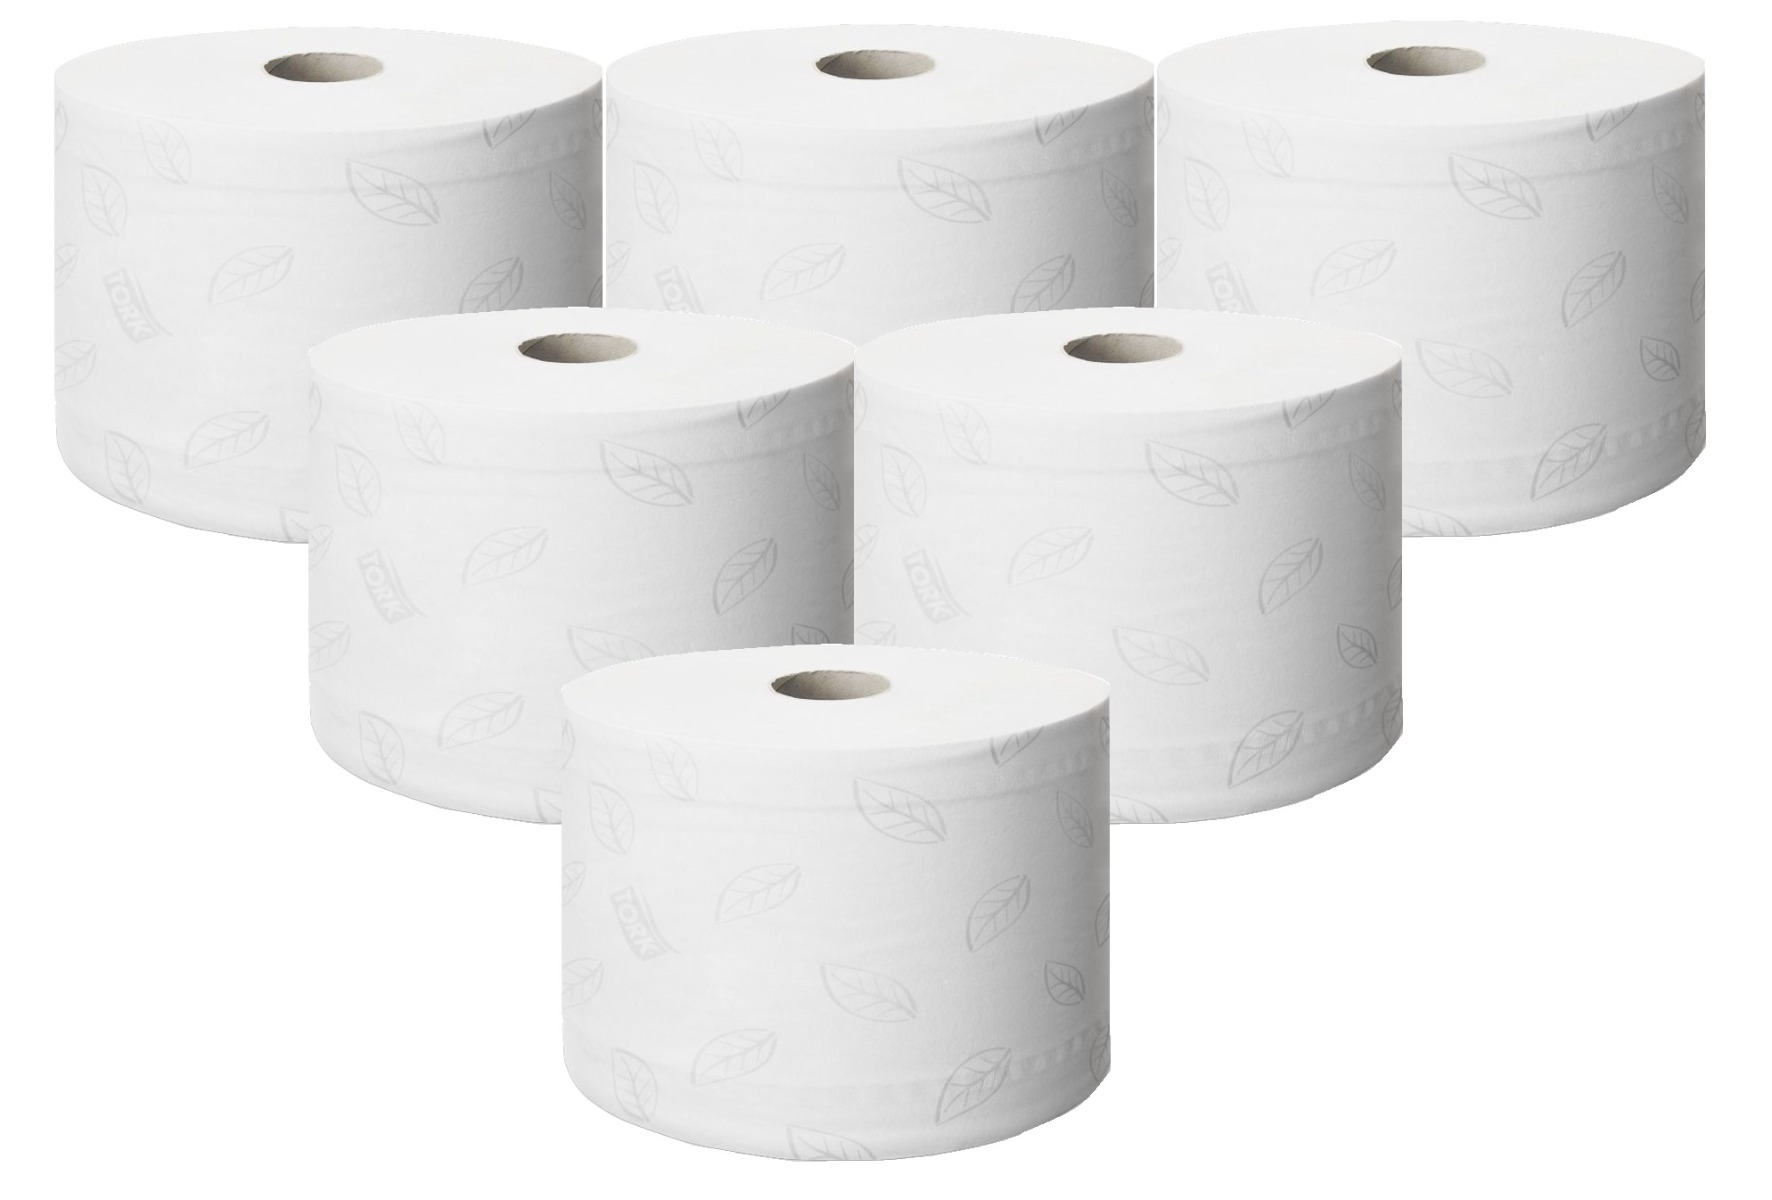 Tork SmartOne® Toilet Tissue Roll 2 Ply- 6 Rolls